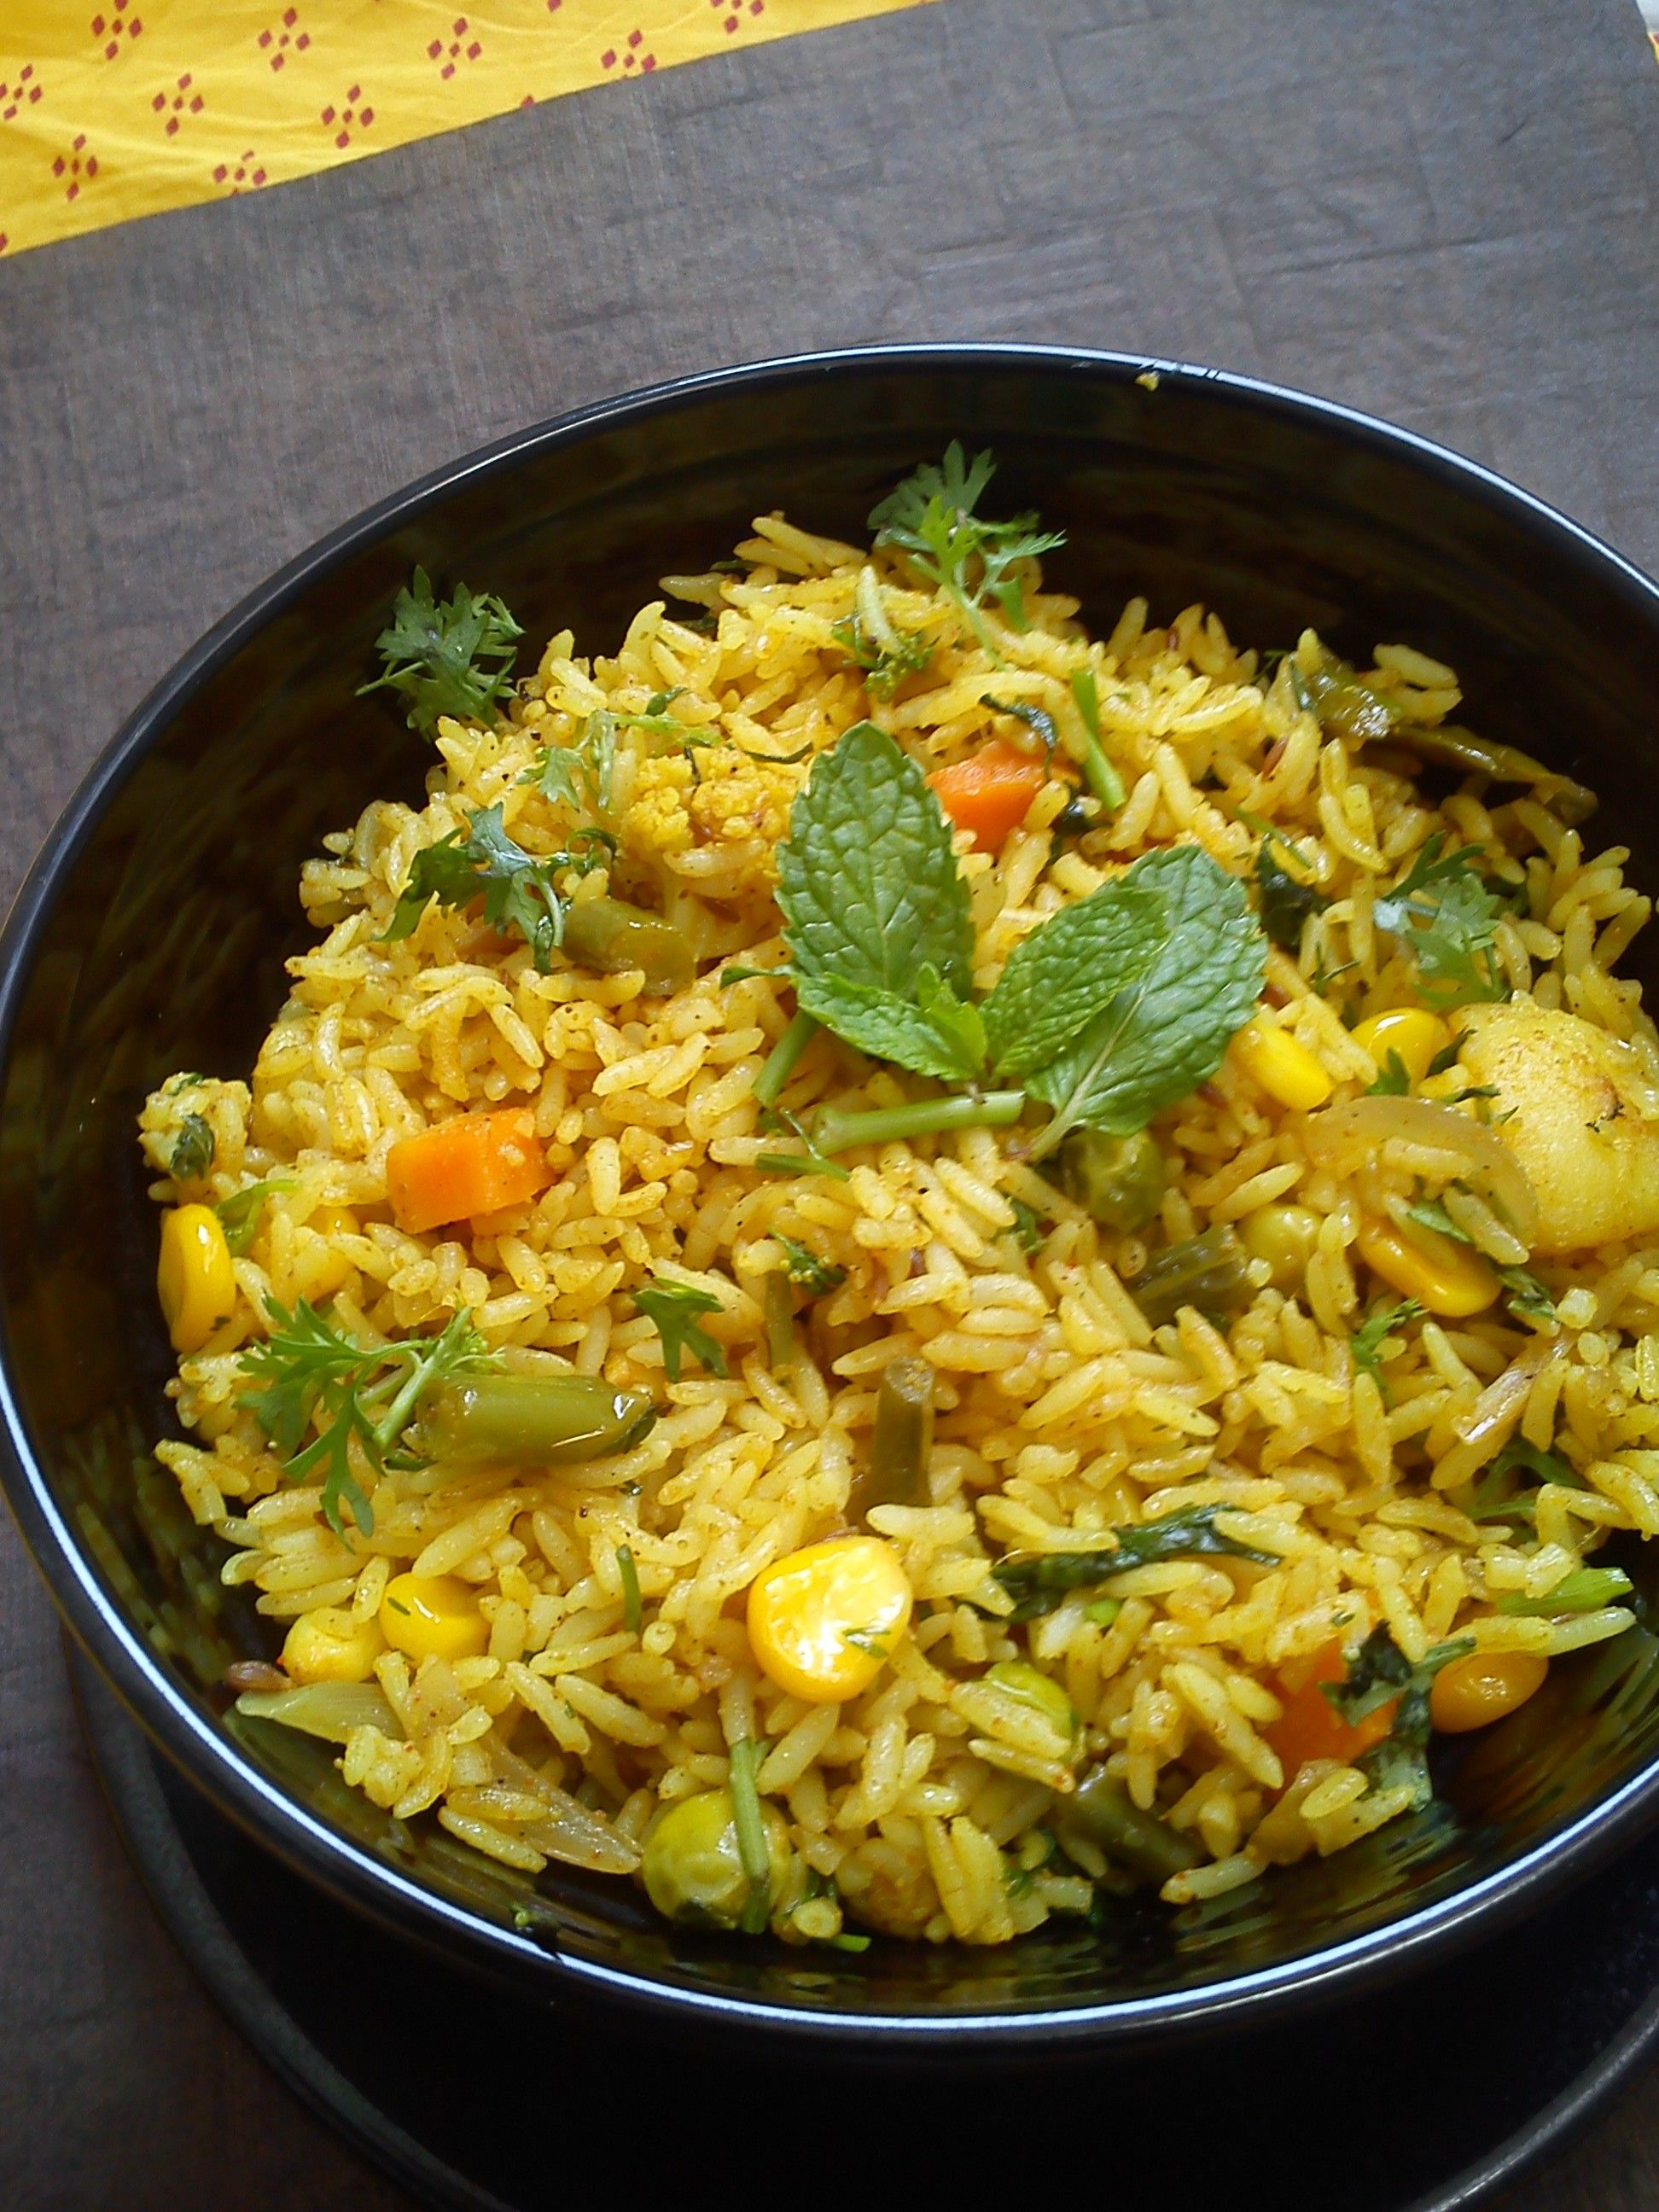 Tahari traditional uttar pradesh recipe by chaitra aathidhyam tahari traditional uttar pradesh recipe by chaitra aathidhyam recipe biryani recipes and food forumfinder Images